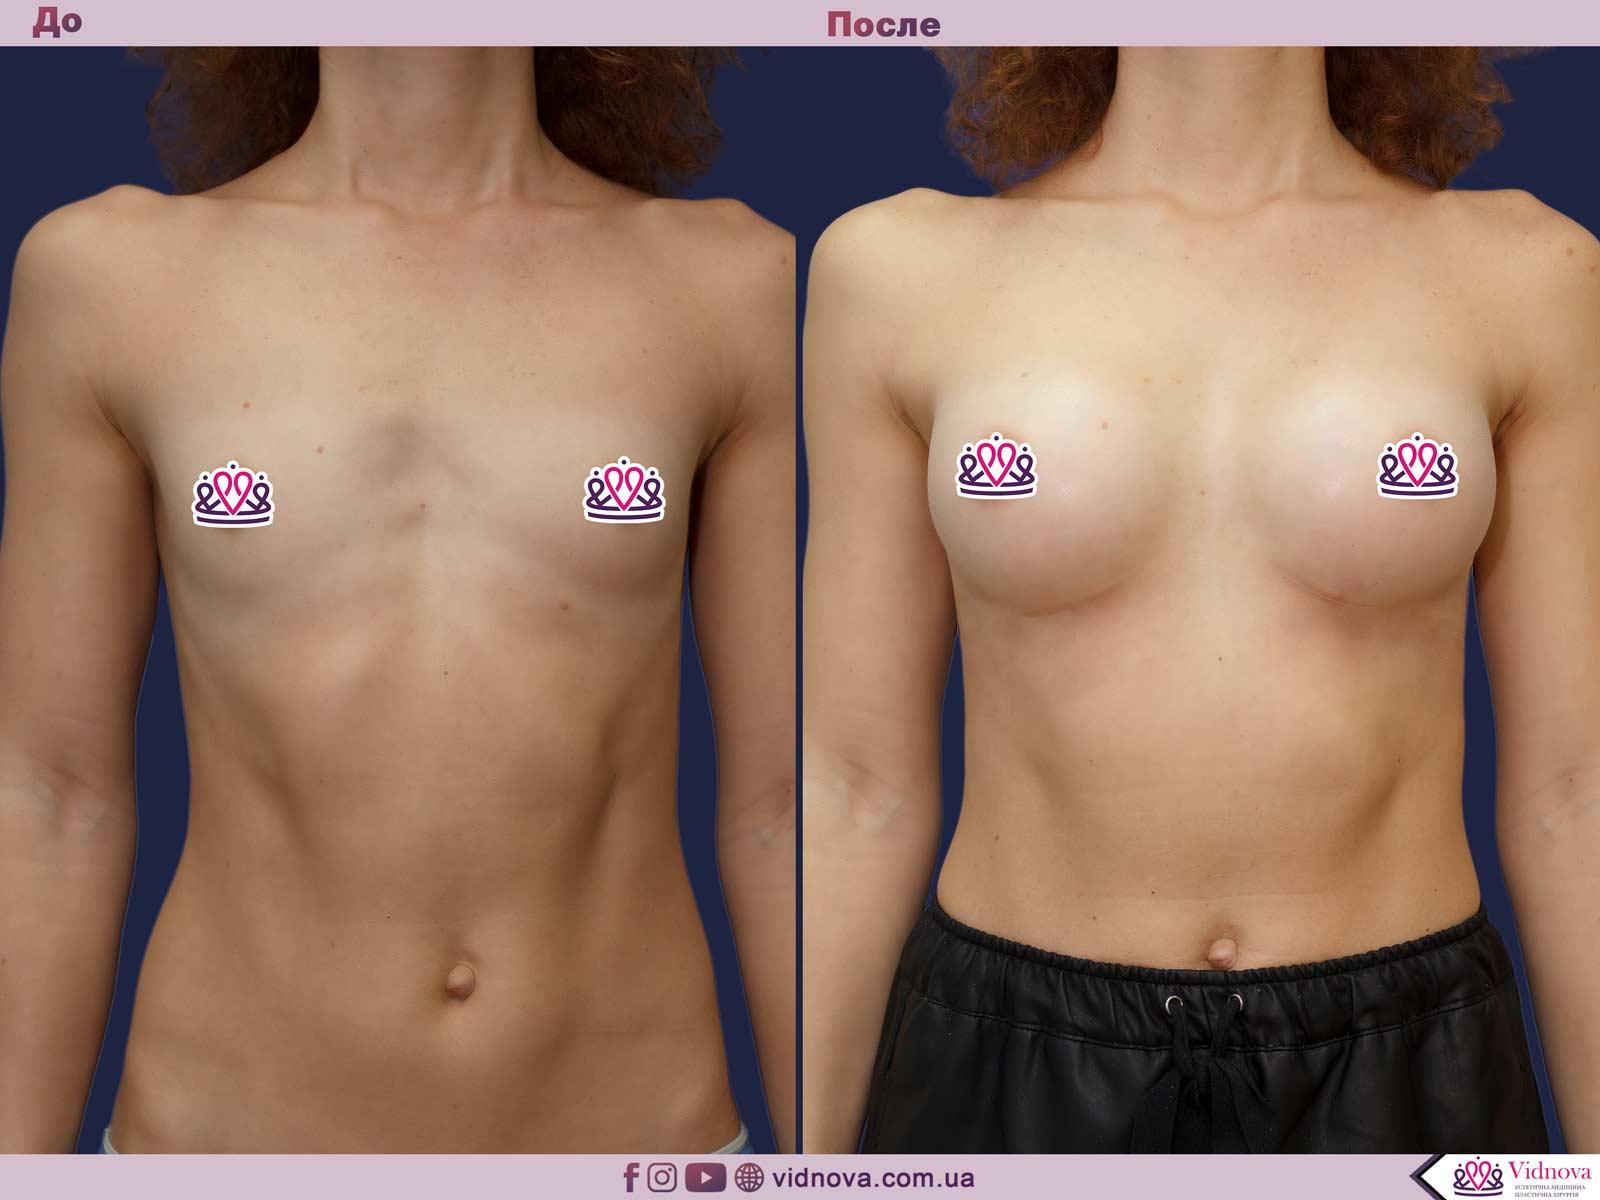 Увеличение груди: Фото ДО и ПОСЛЕ - Пример №70-1 - Клиника Vidnova